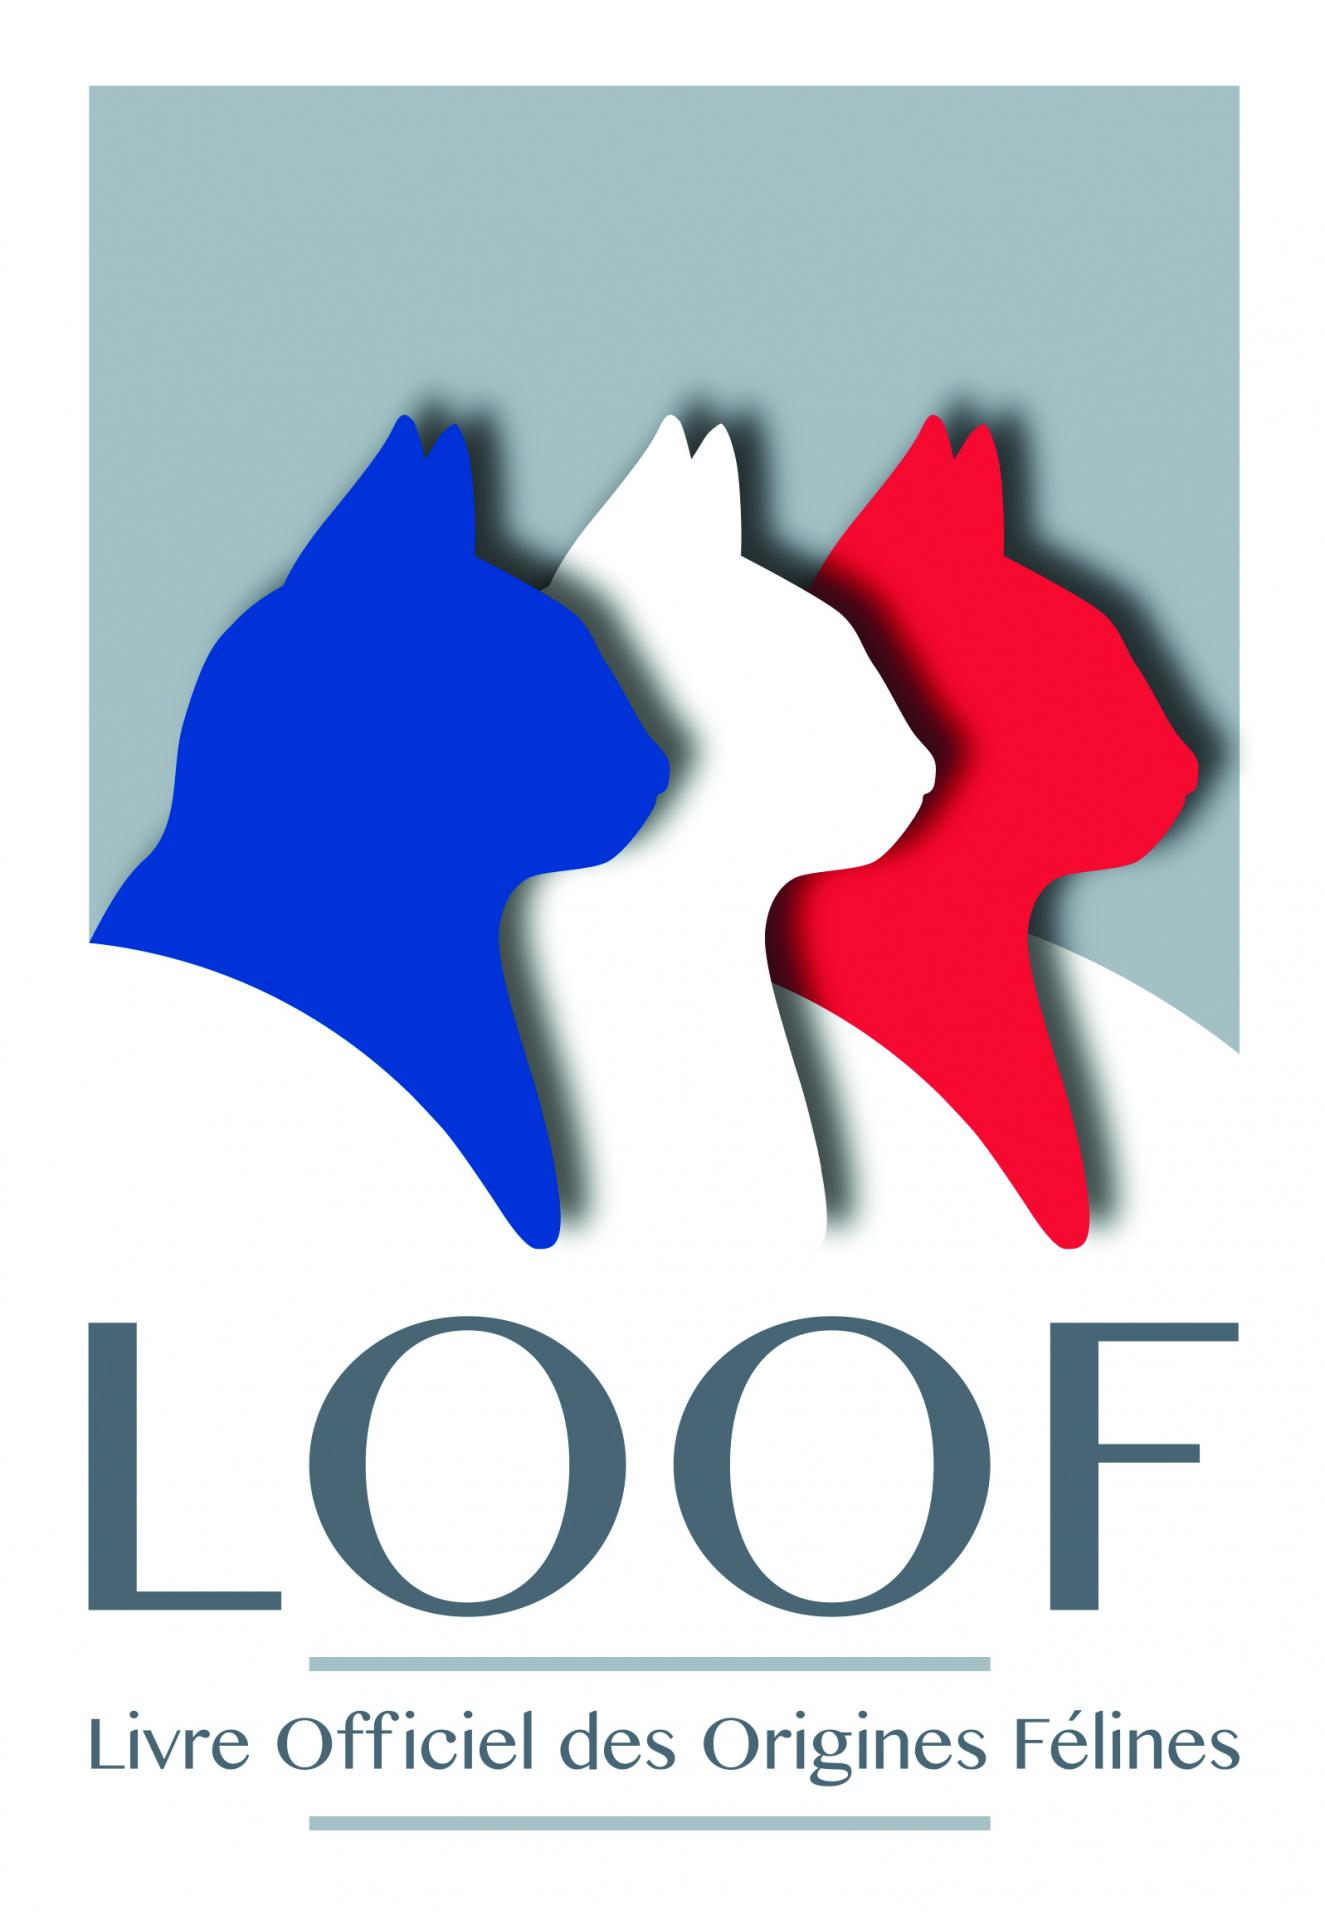 Loof logo zone utile 3